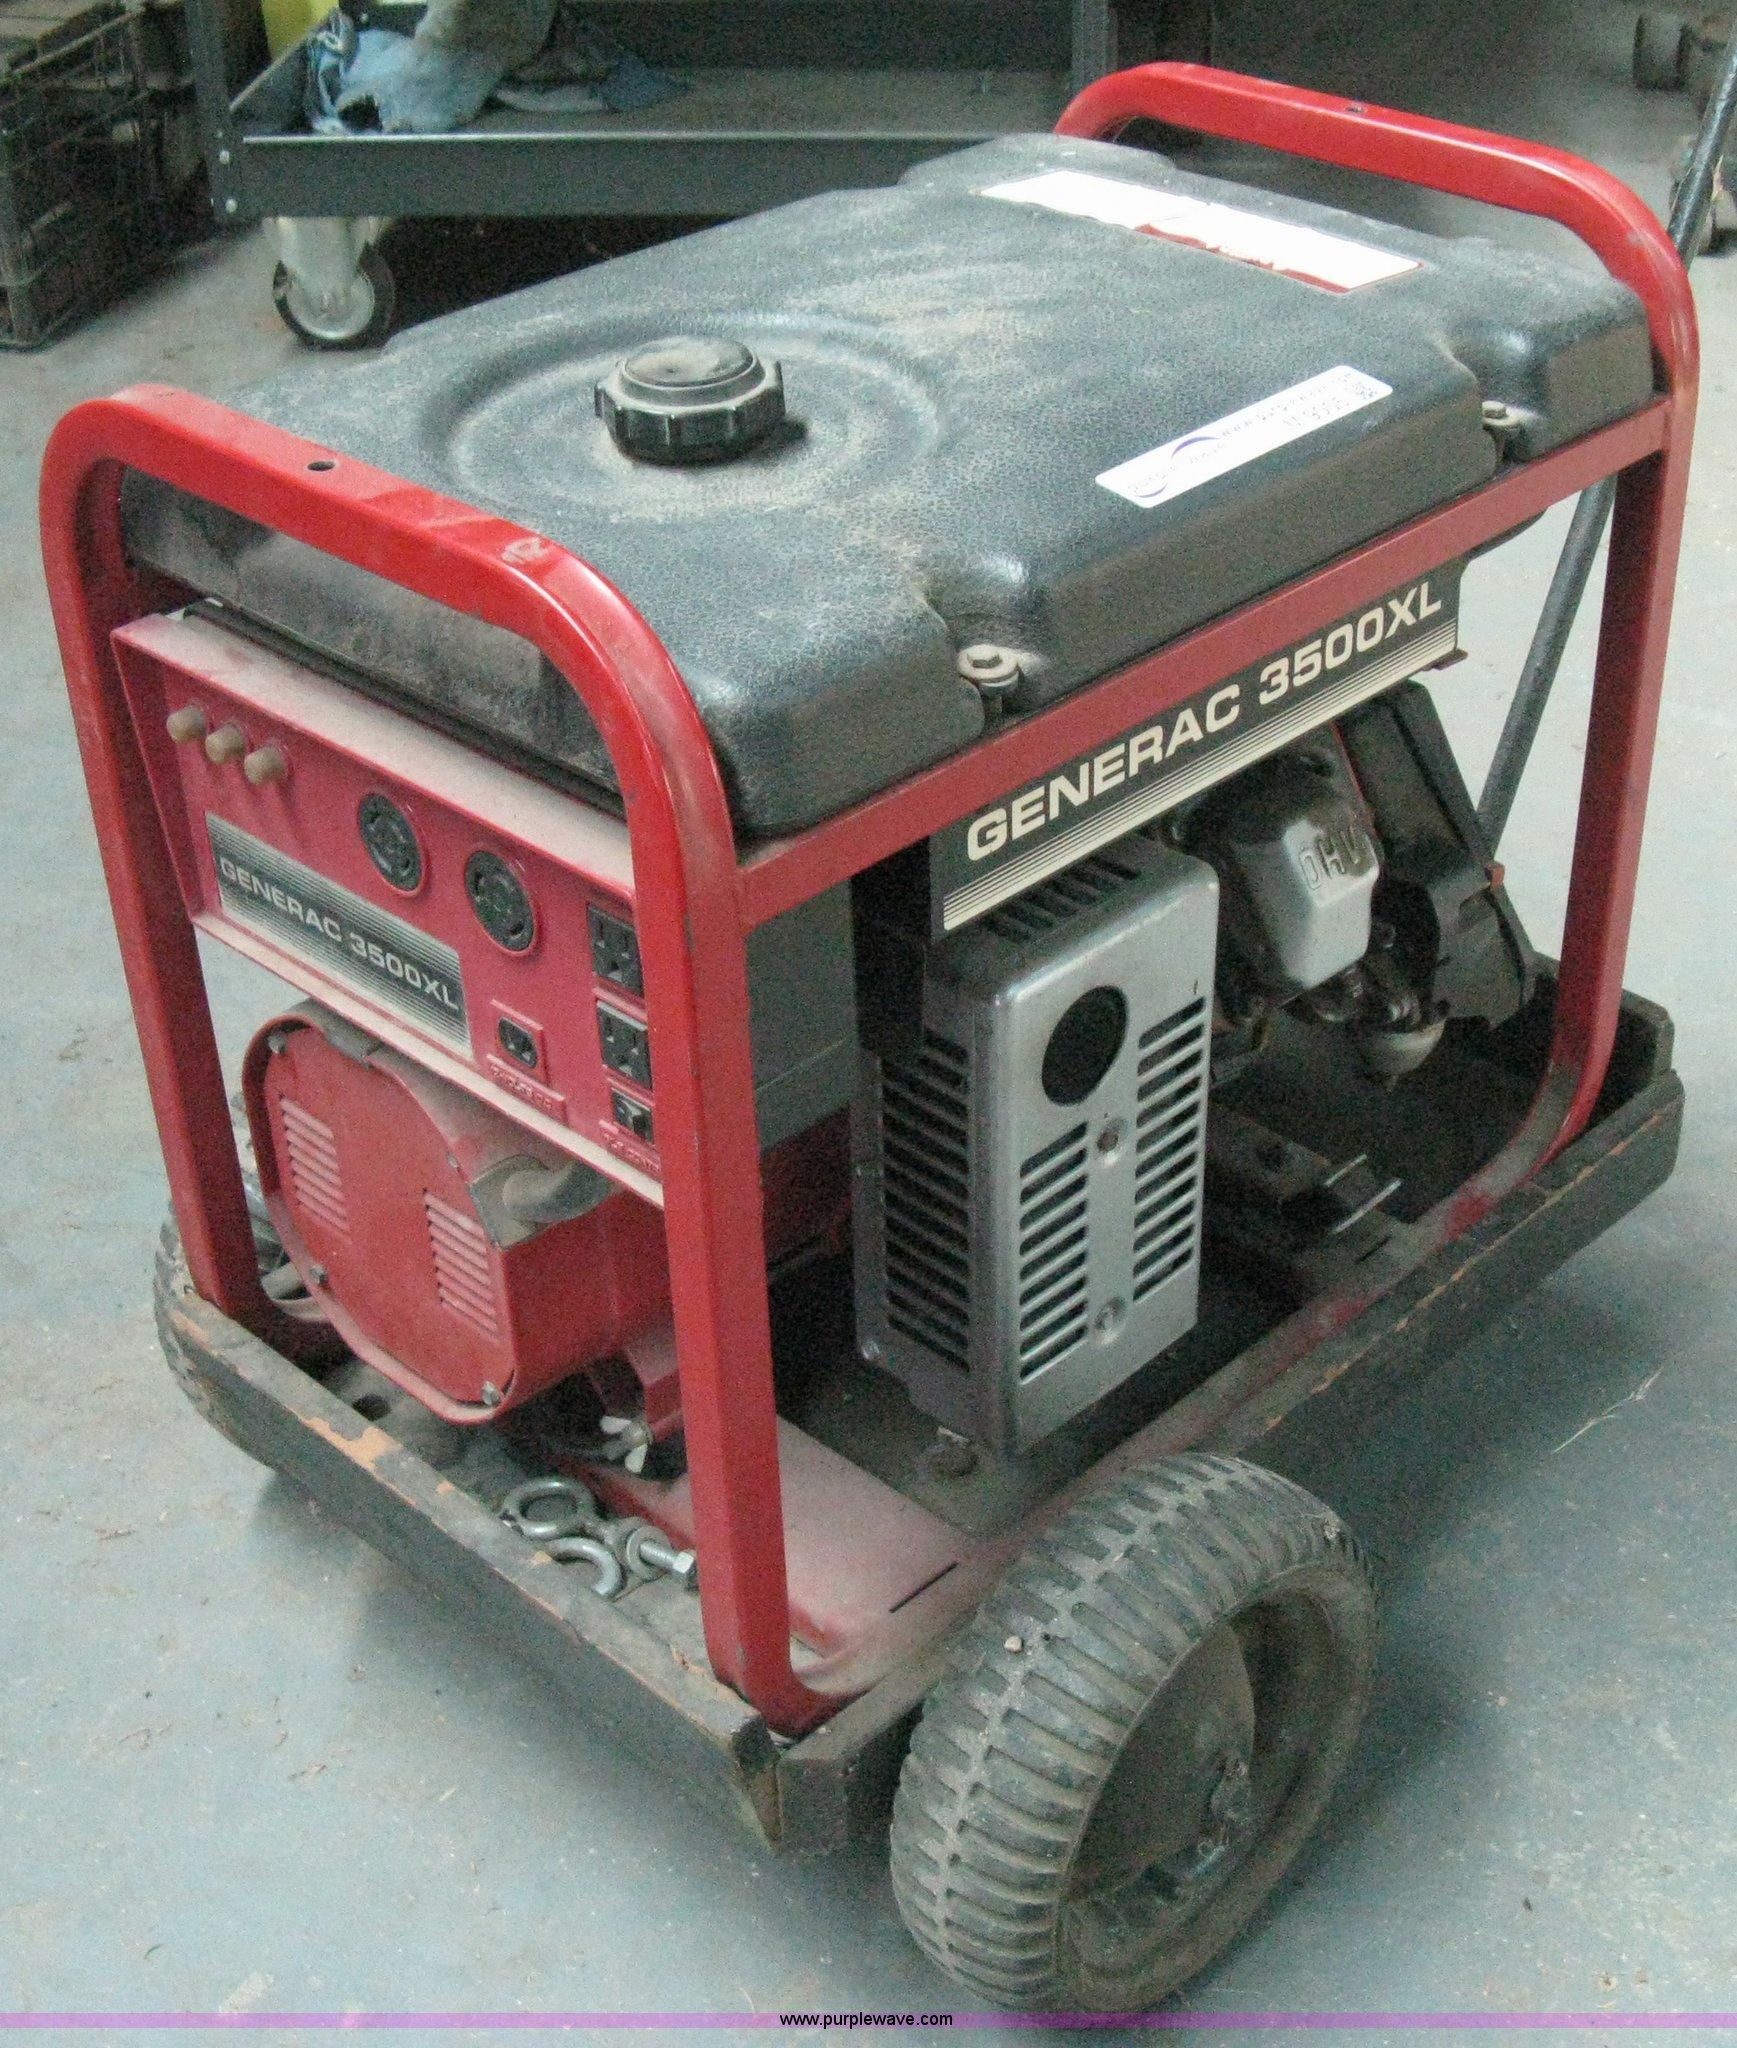 Generac 3500XL generator | Item M9005 | SOLD! October 31 Mid